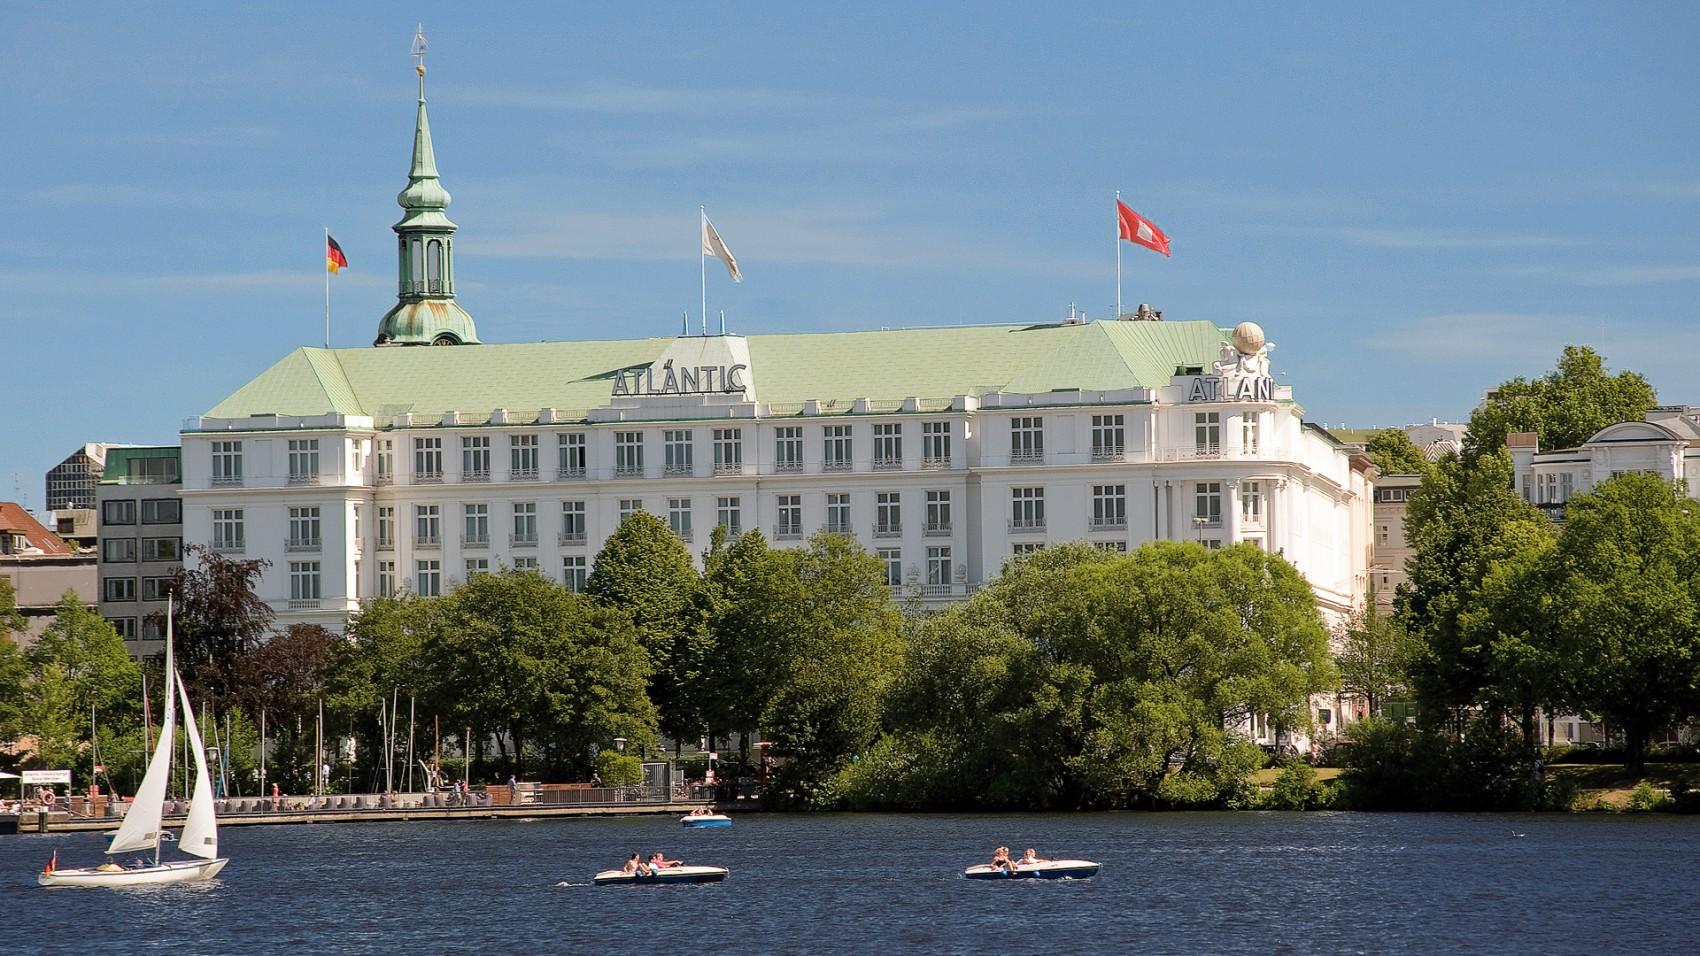 Exterior view of Kempinski Atlantic Hotel Hamburg.